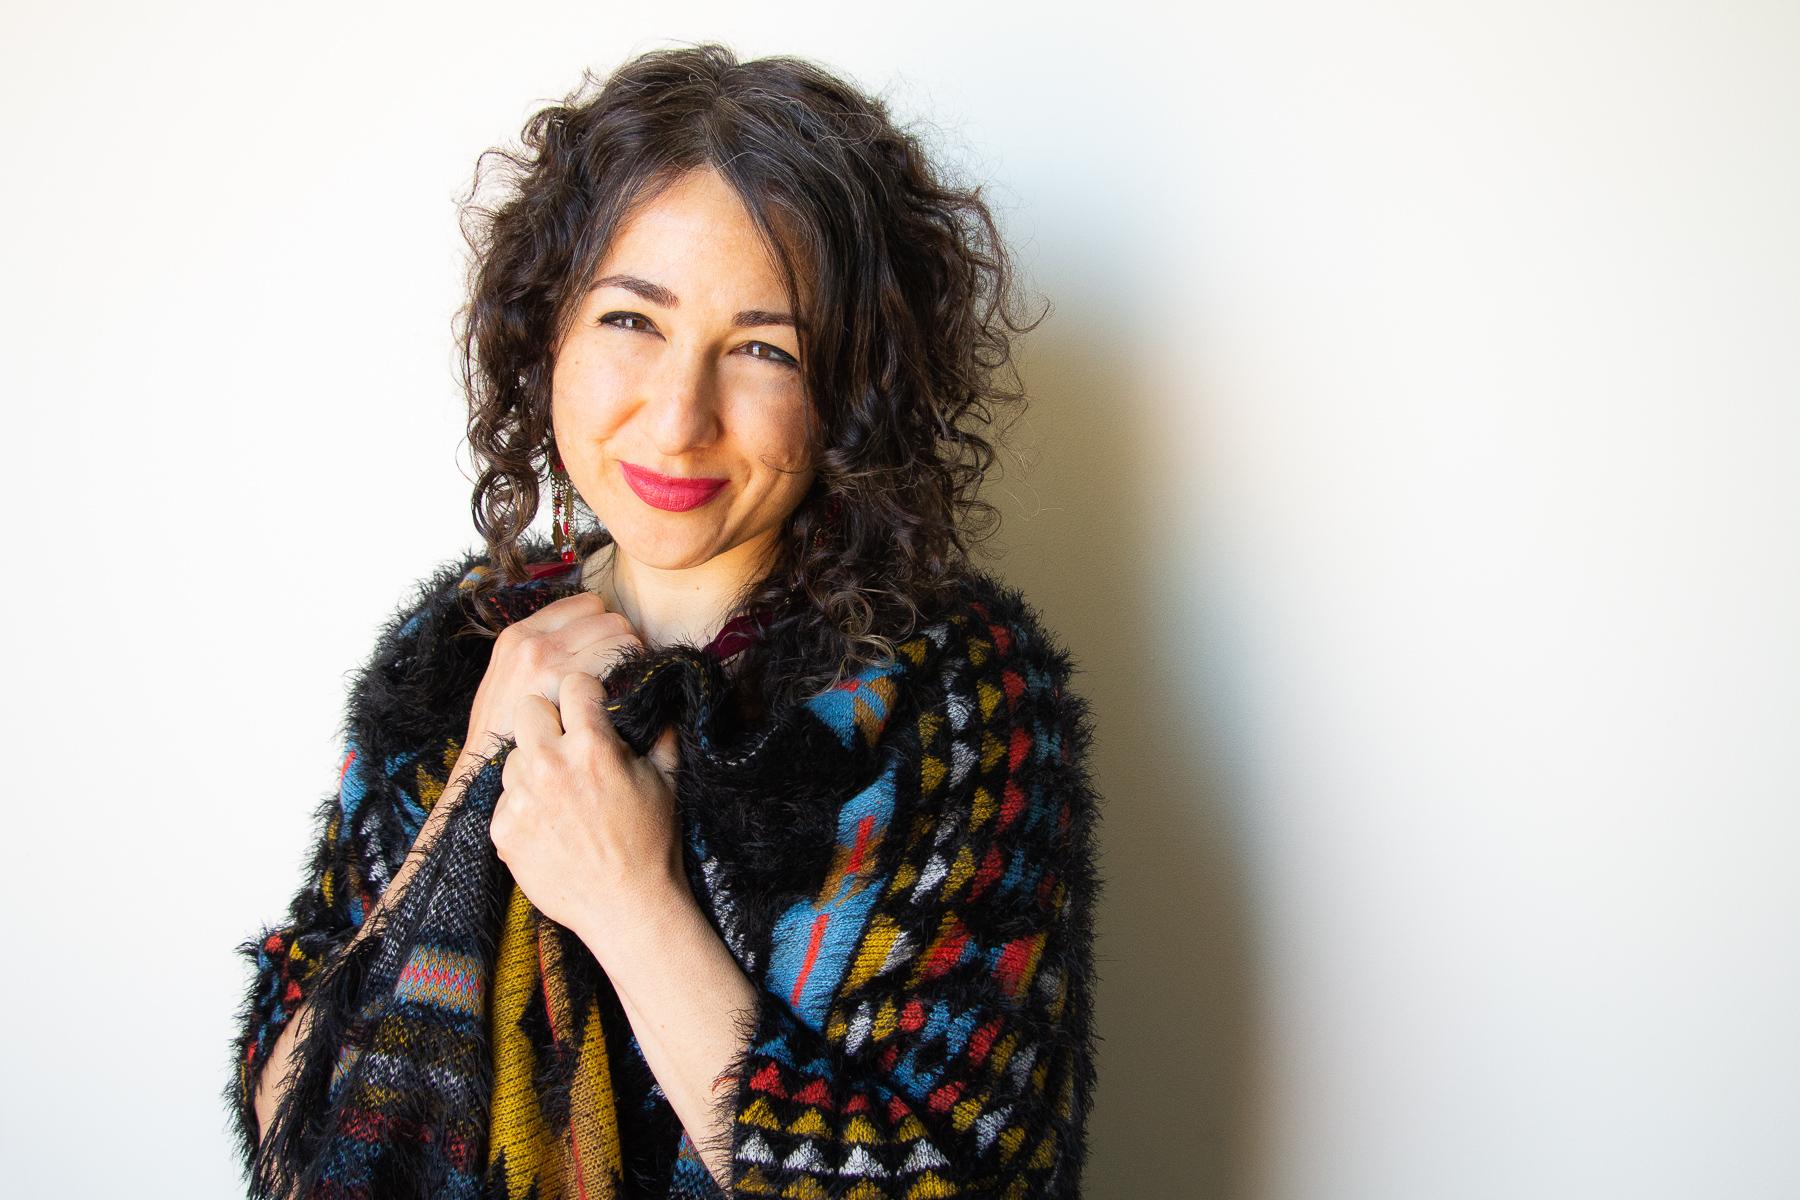 Dr. Jessica Tartaro - Intimacy Therapist & Connection Facilitator, Founder of SpeakUP PNW